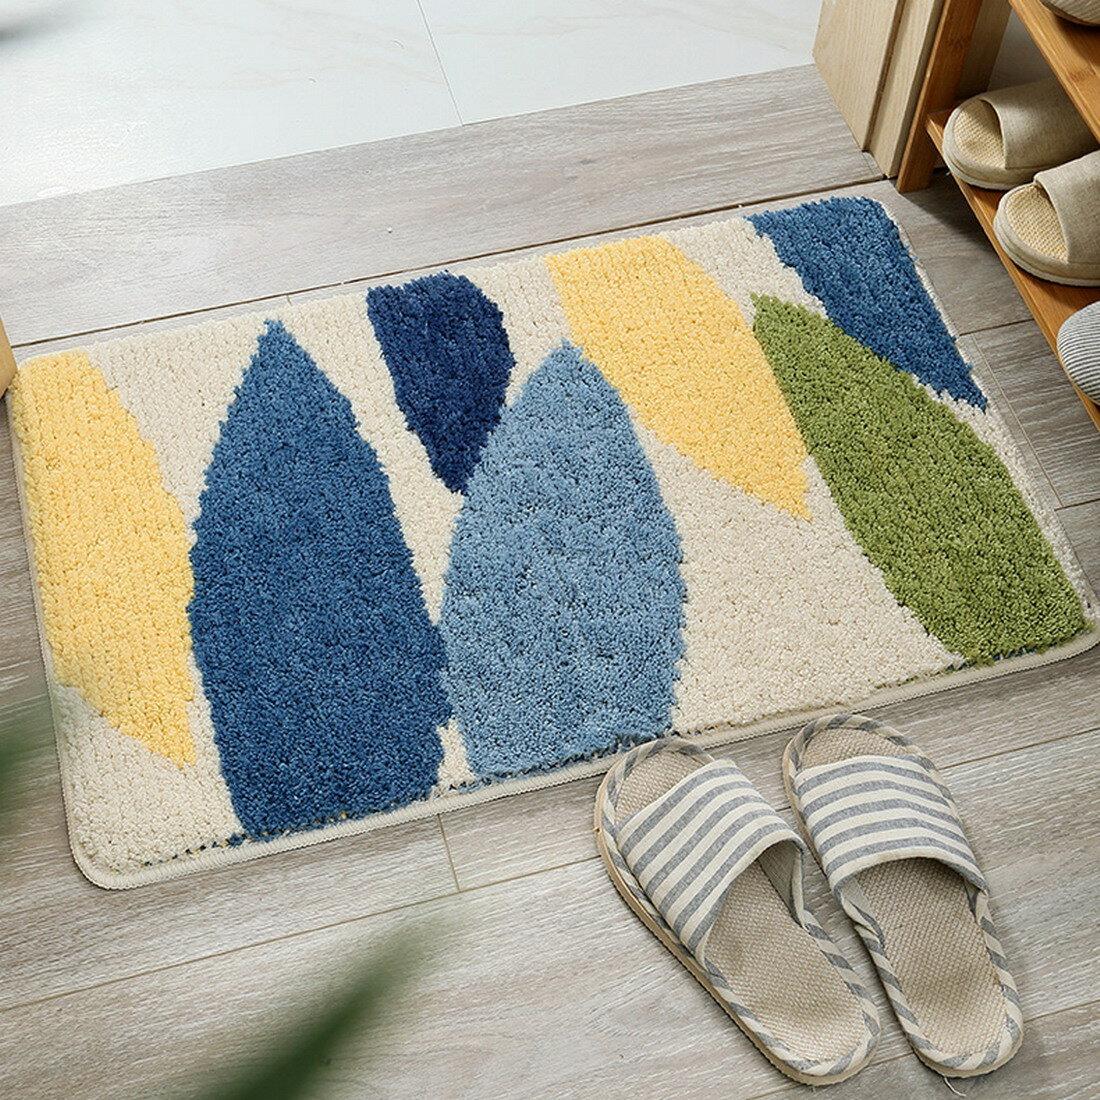 Non-slip Soft Memory Foam Bath Bathroom Shower Door Floor Mat Rug Pad Carpet Hot